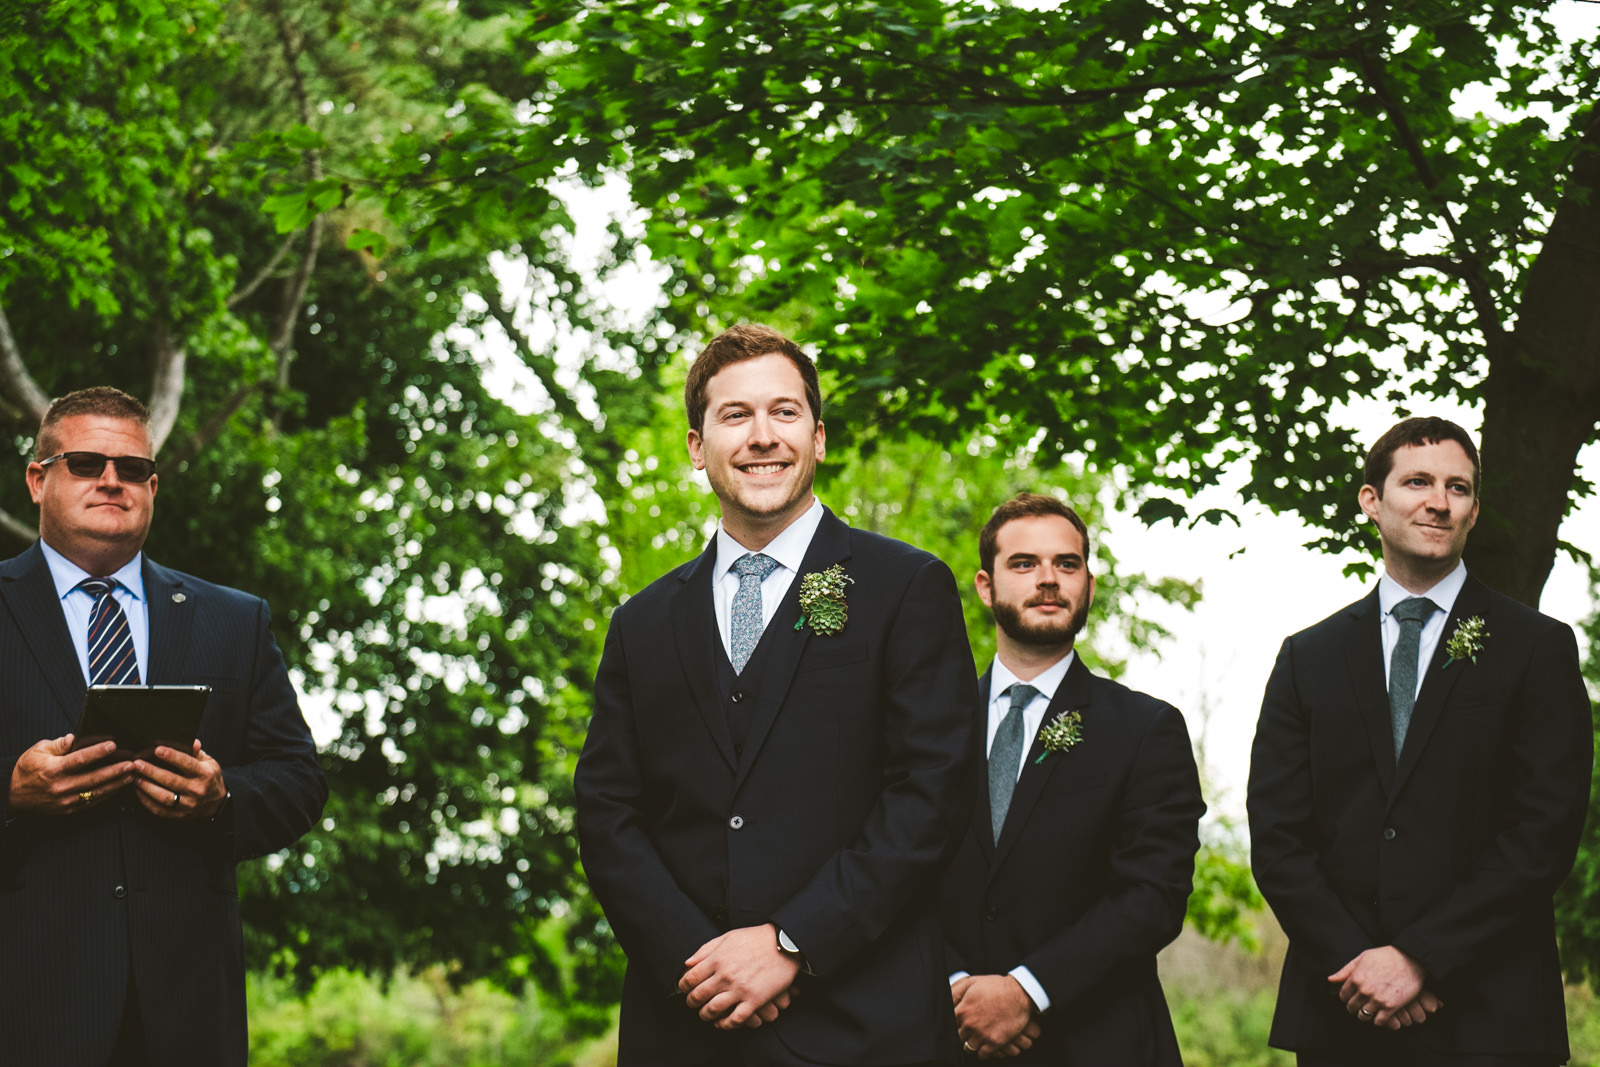 Gervasi Vineyard Outdoor Wedding Ceremony with Toledo Ohio Wedding Photographers in Cleveland